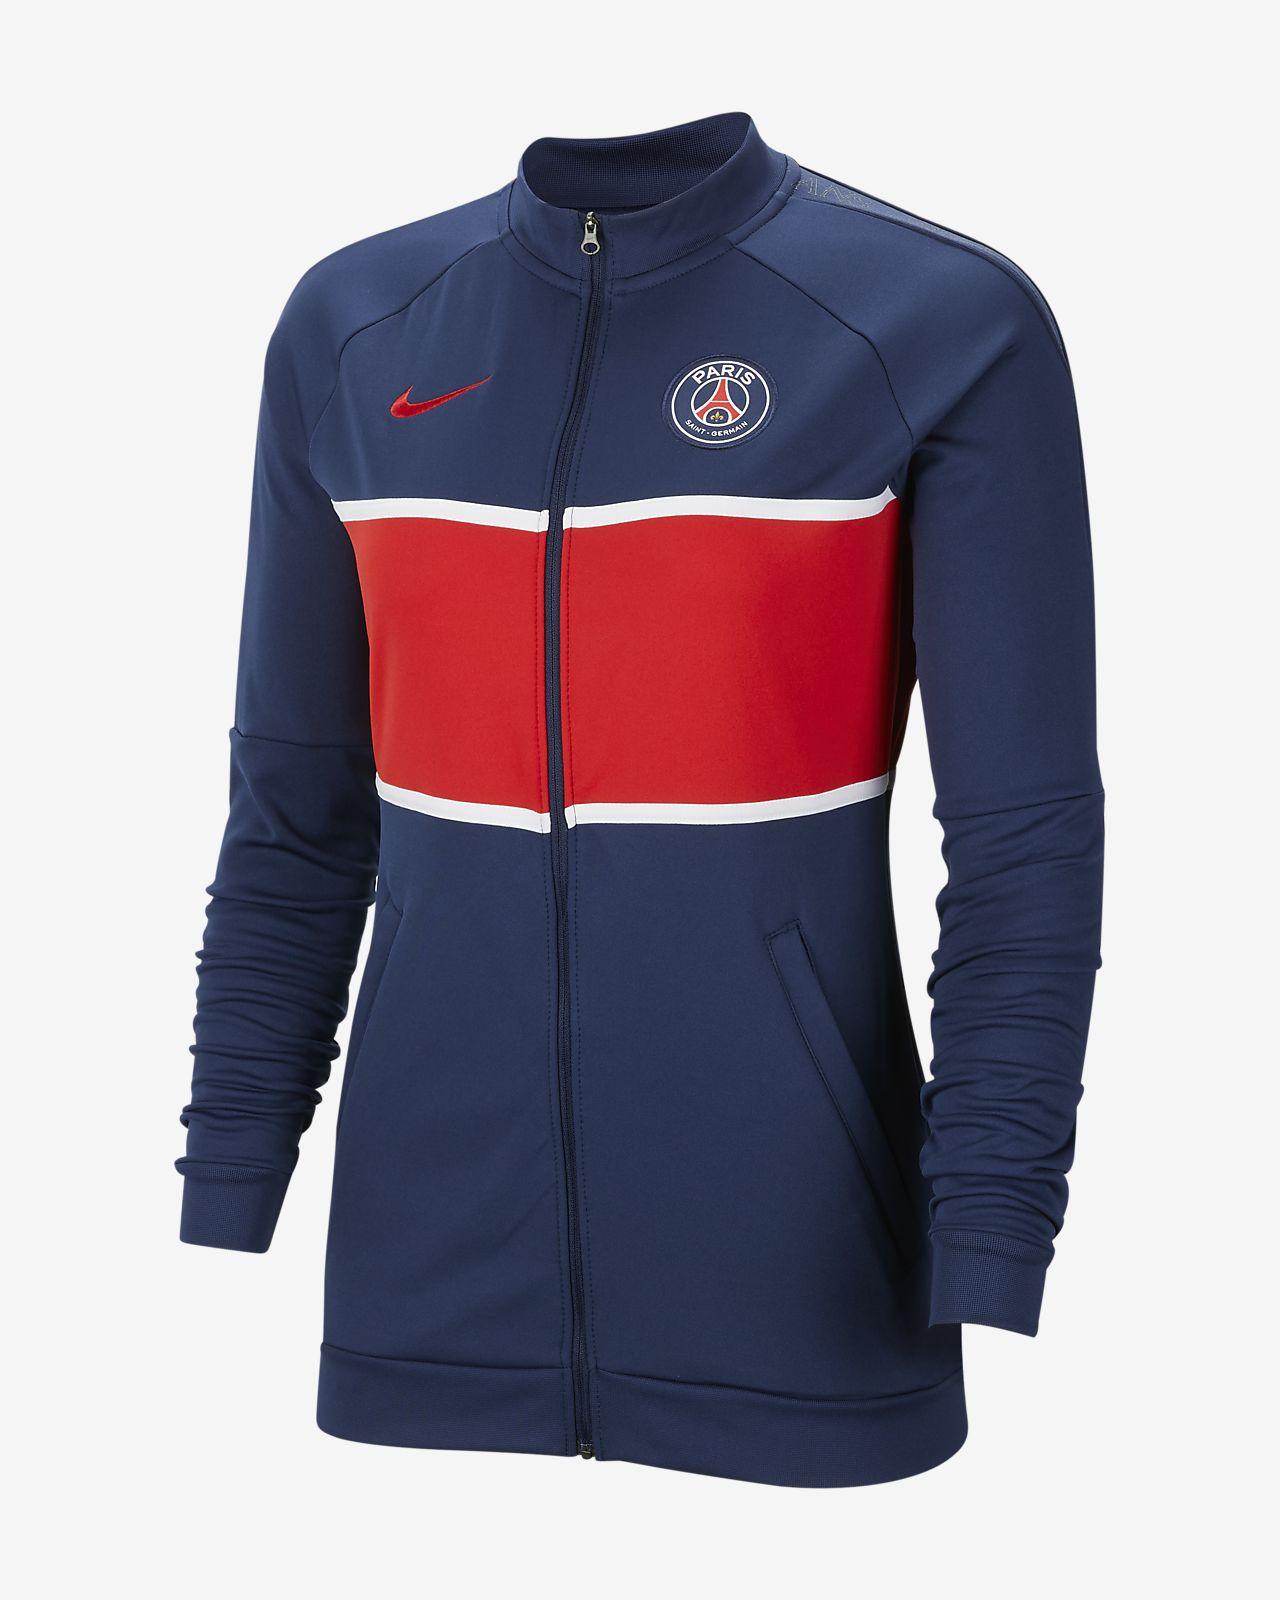 Paris Saint-Germain Women's Football Tracksuit Jacket